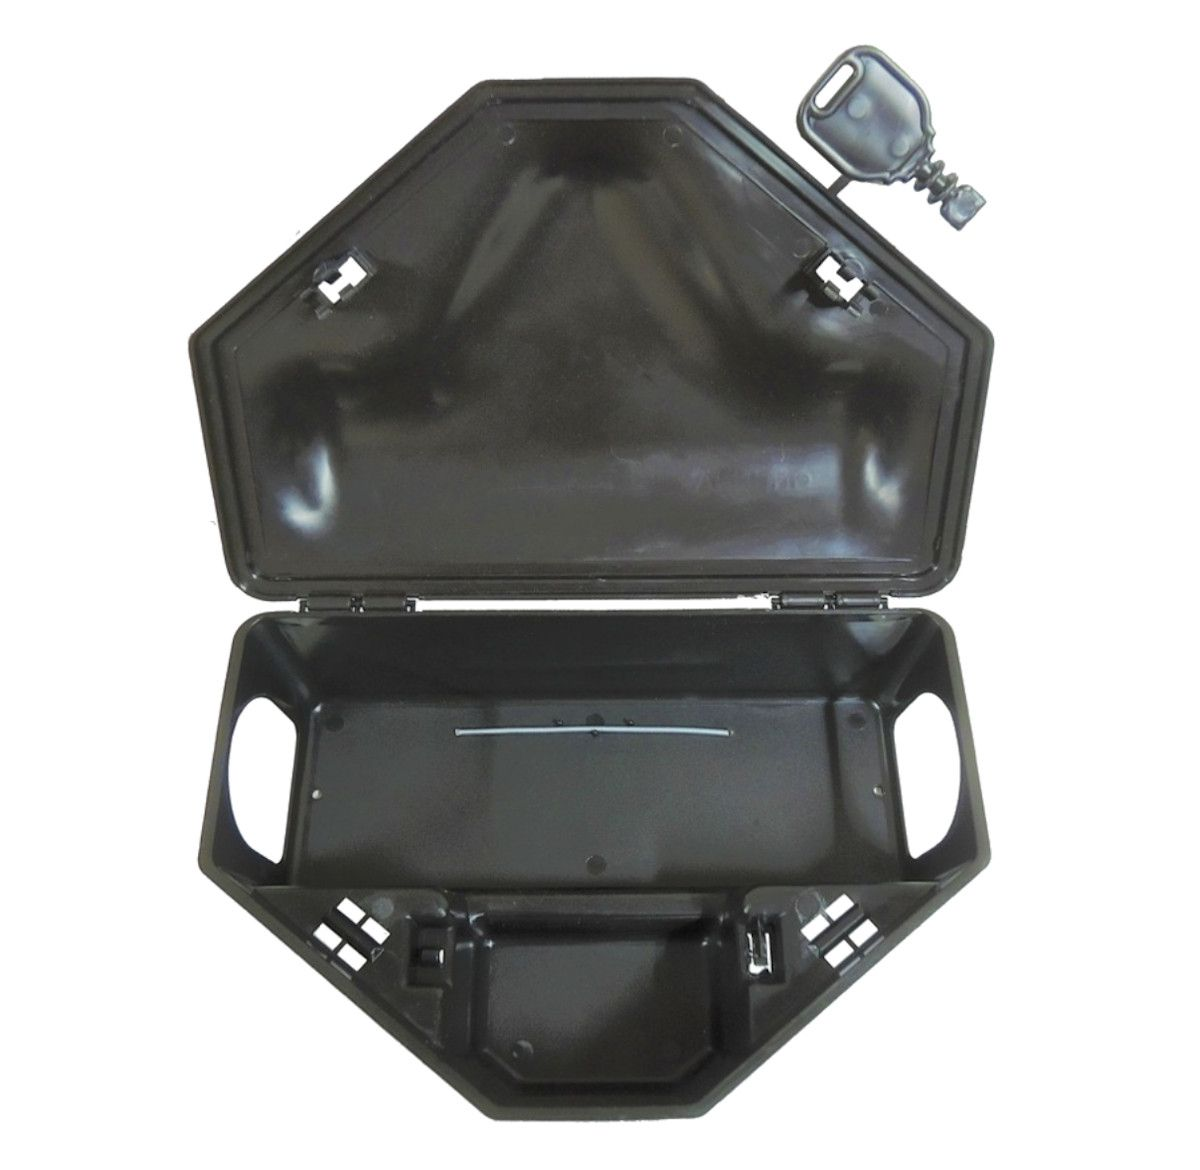 Kit 4 Porta Isca + 1 Cartela Gramper 500g (25 Blocos)